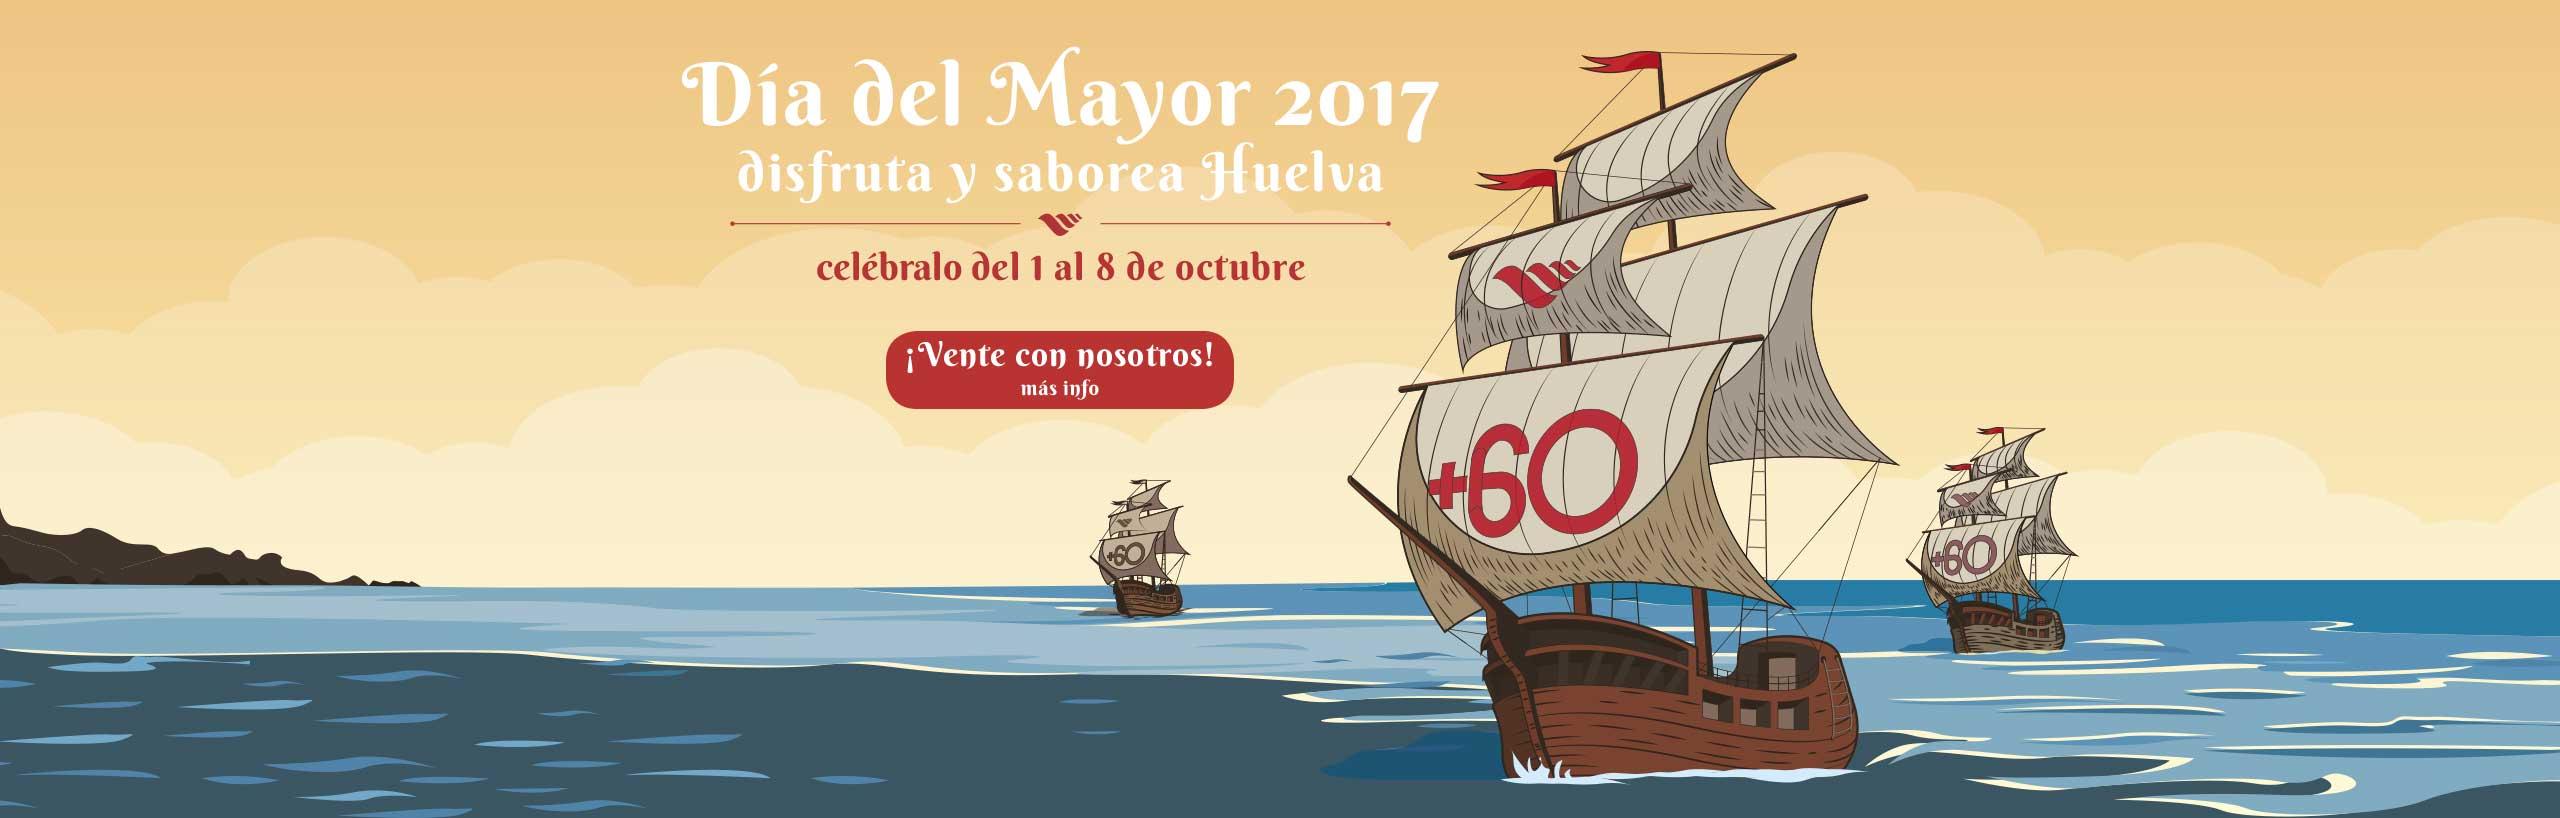 slider-dia_del_mayor